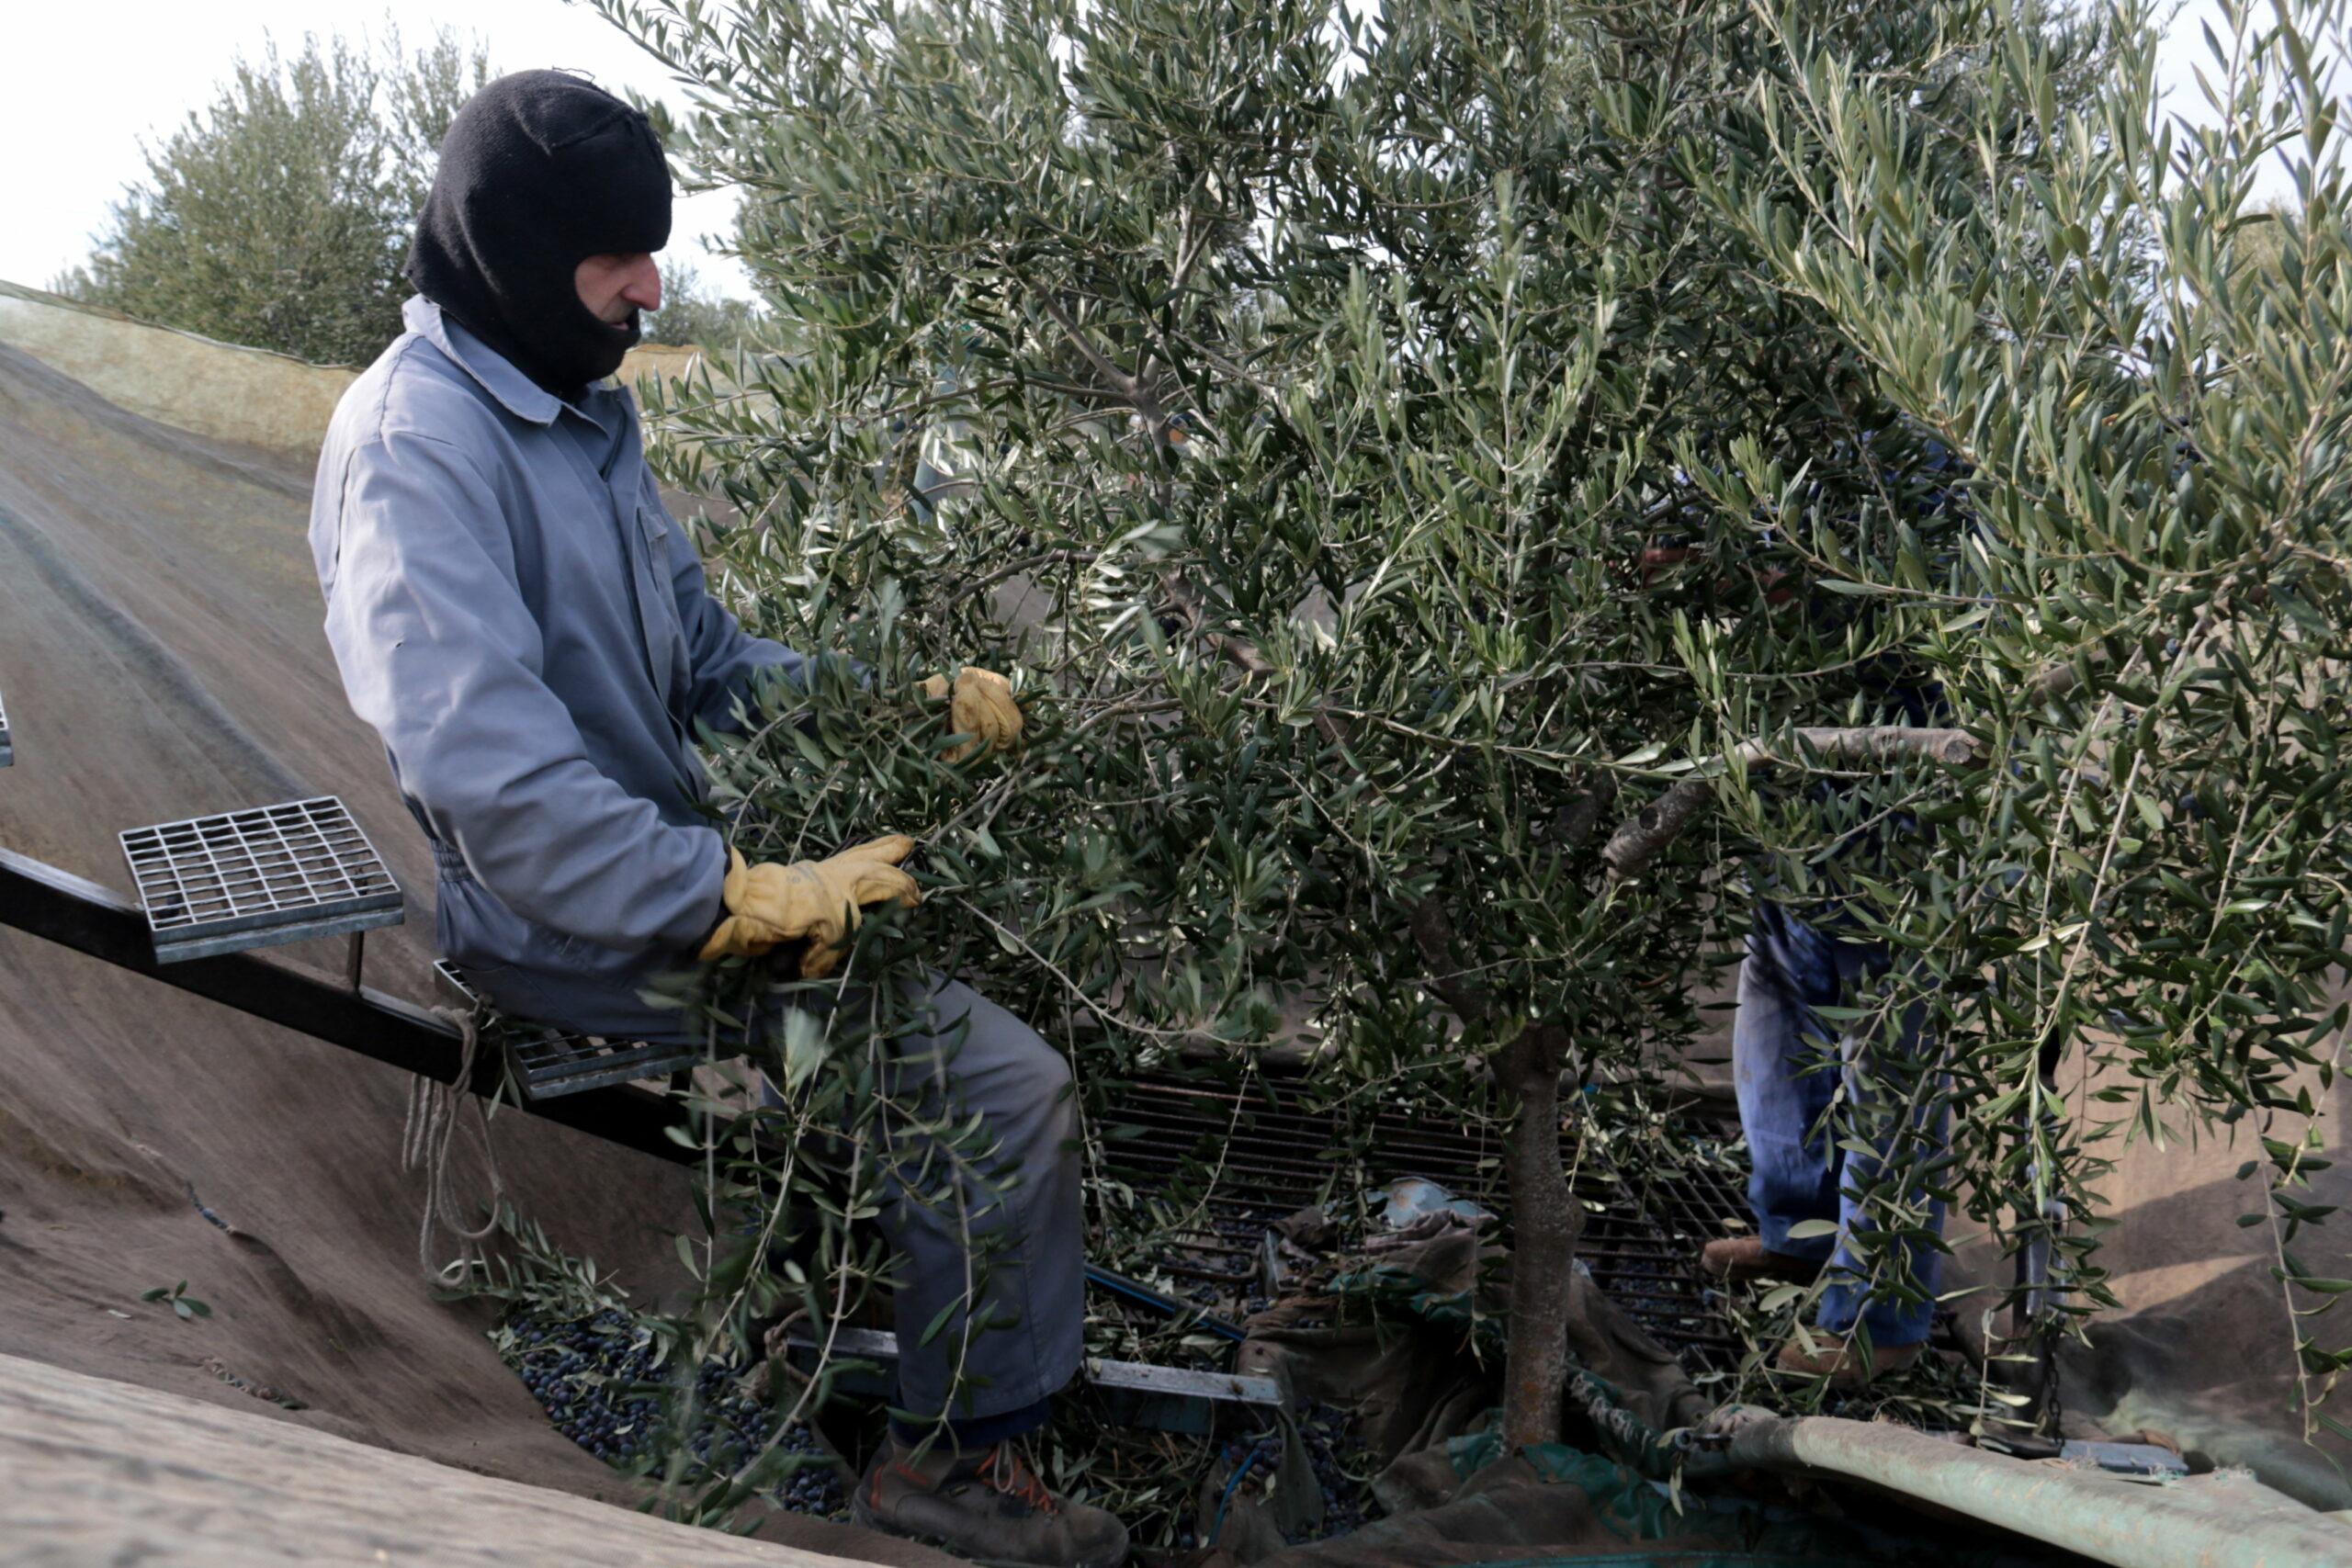 Uns pagesos collint olives en una finca de Maials | ACN